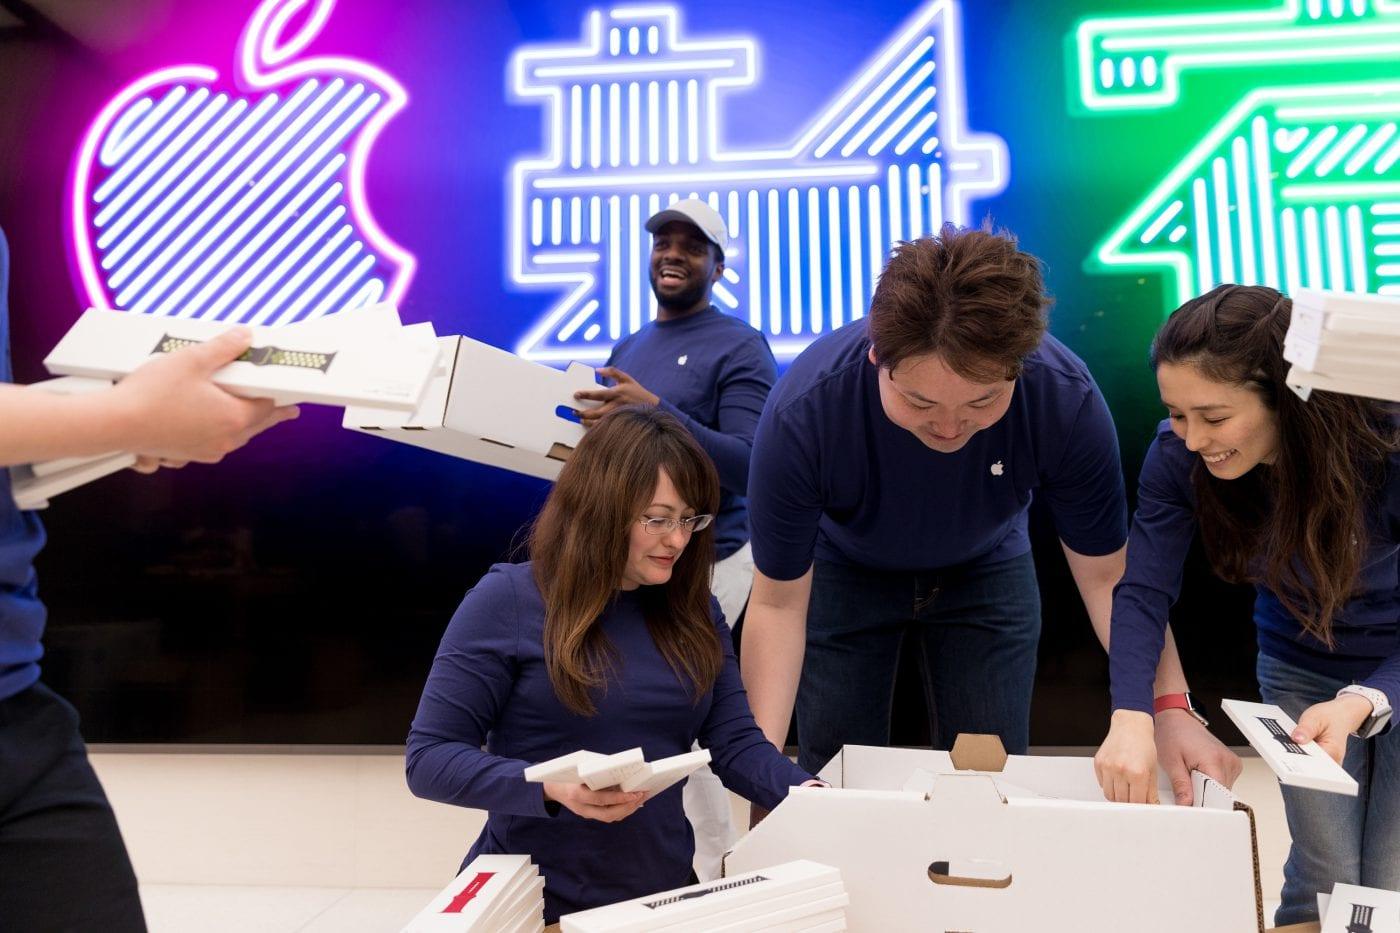 Apple Store Shinjuku Tokyo 2 - Apple sdílel fotky z nového Apple Storu v Shinjuku, Tokyu